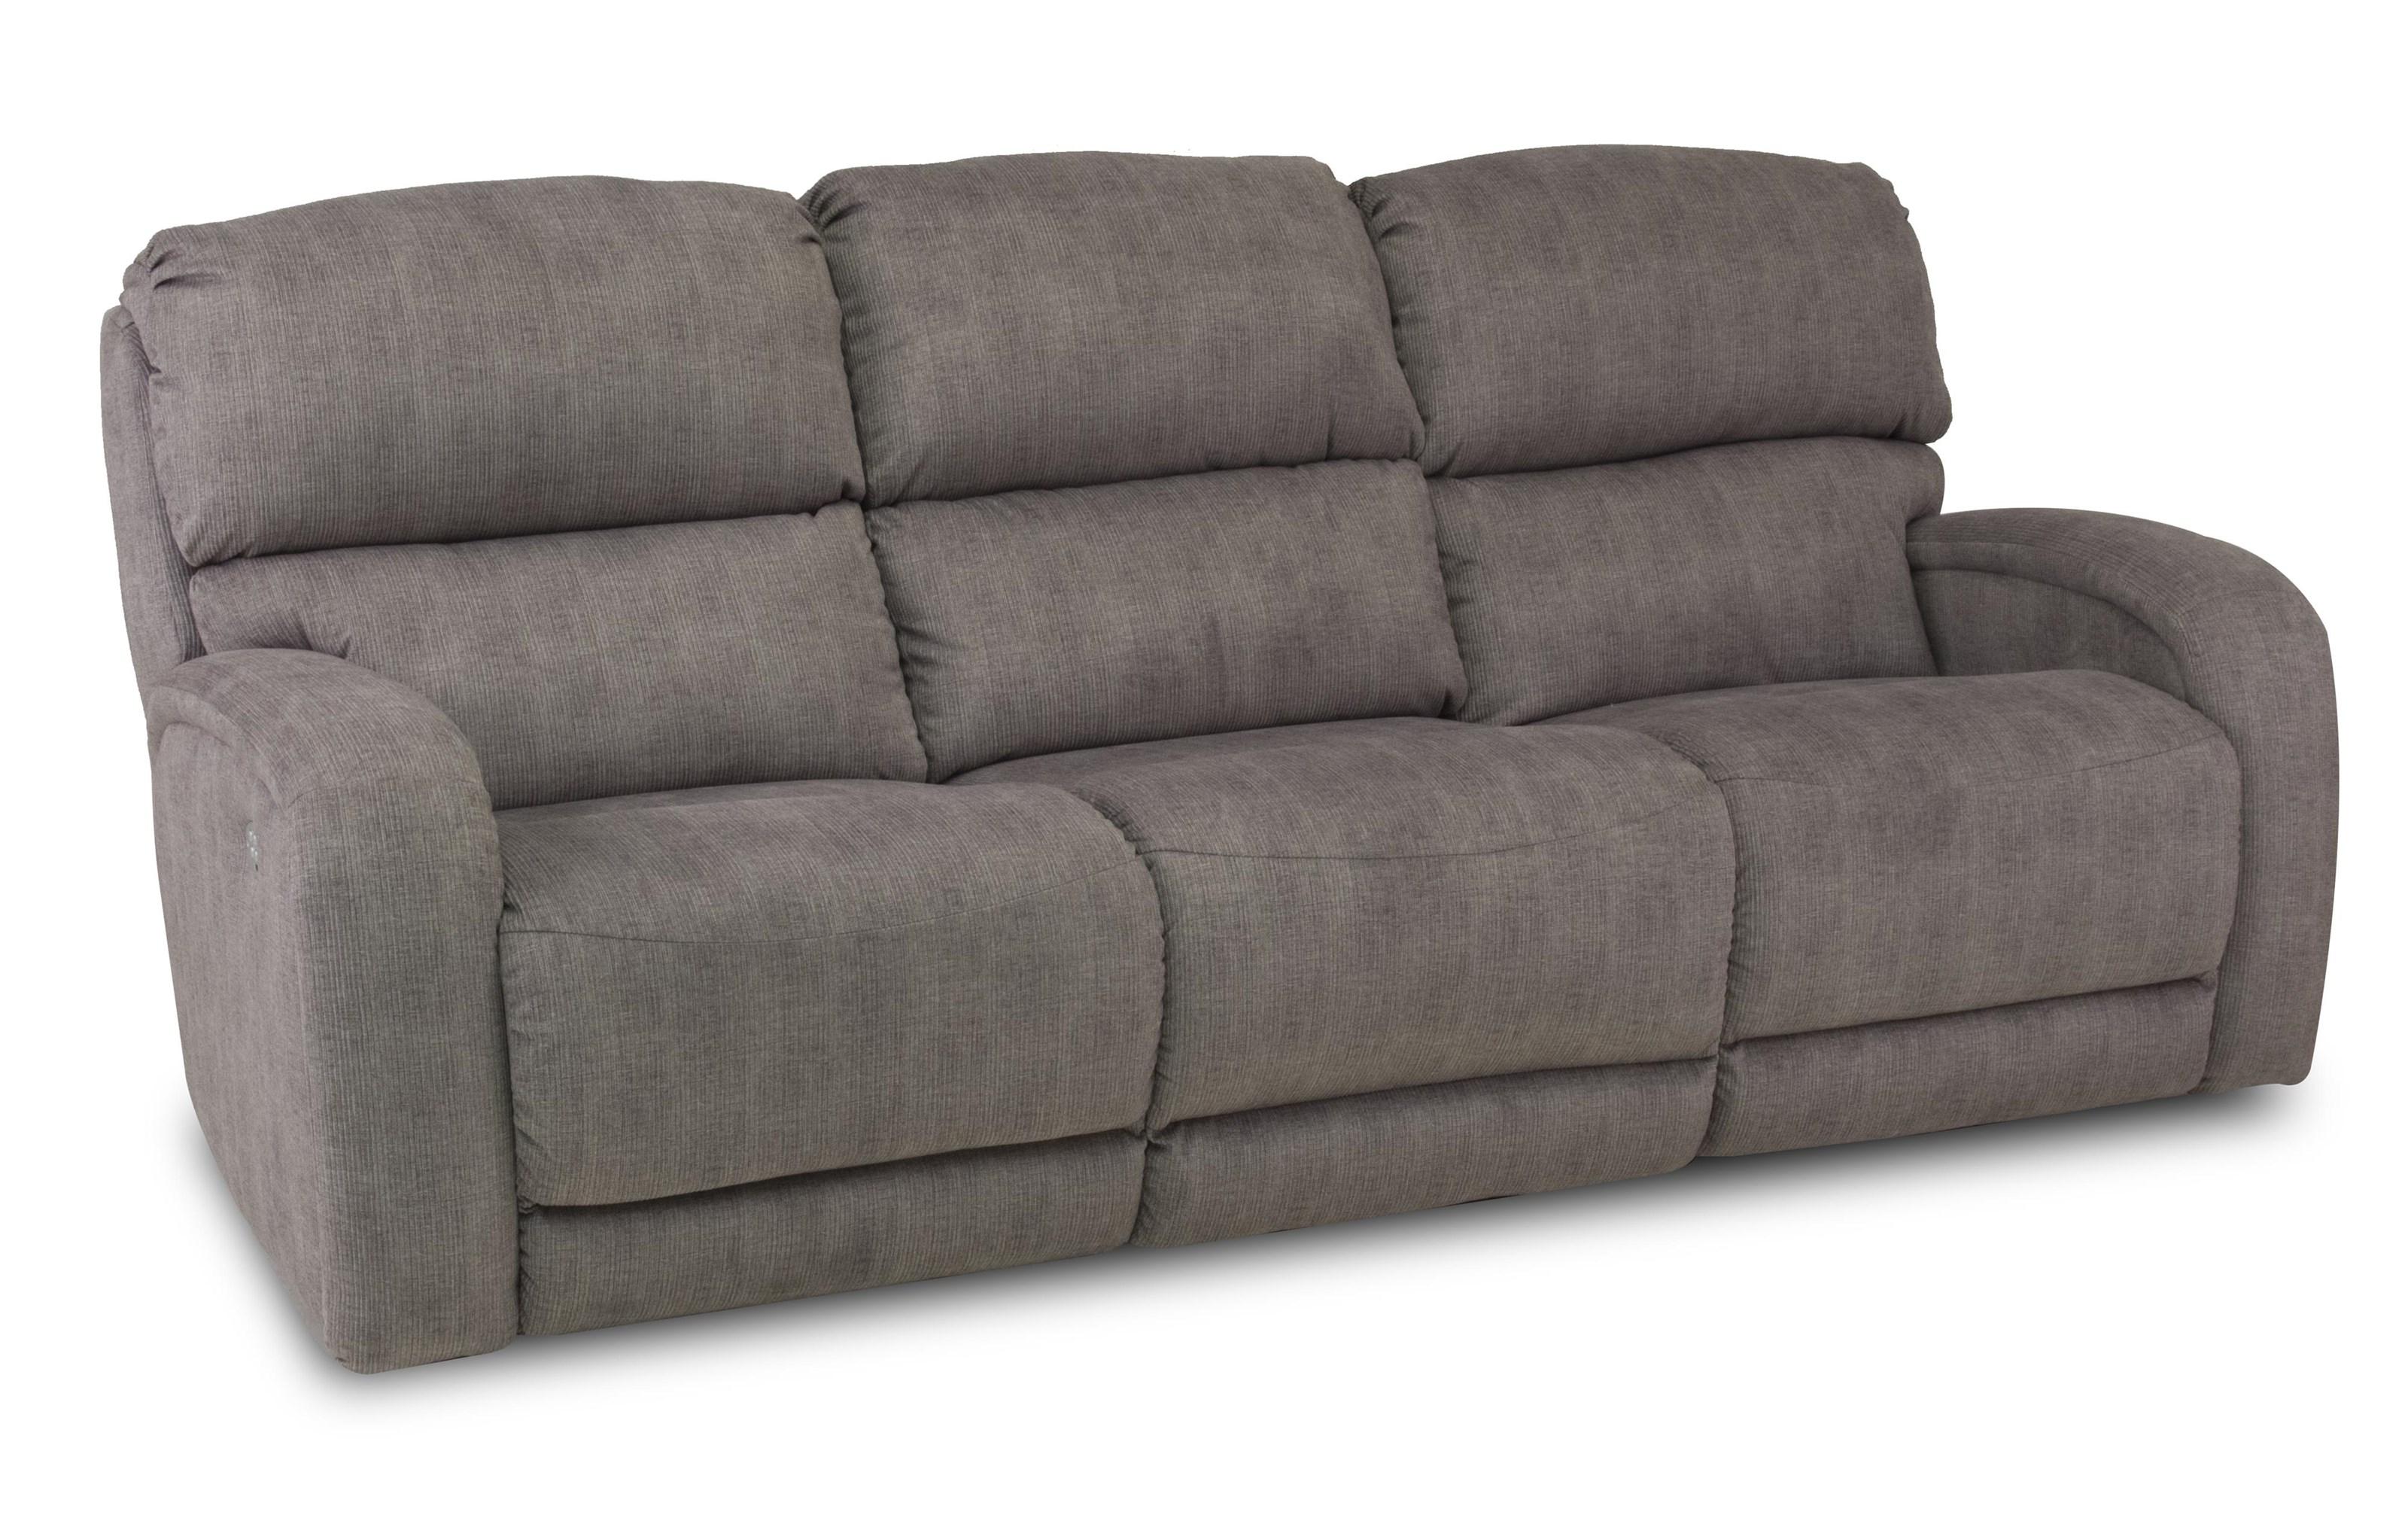 Southern Motion Fandango Power Headrest Reclining Sofa